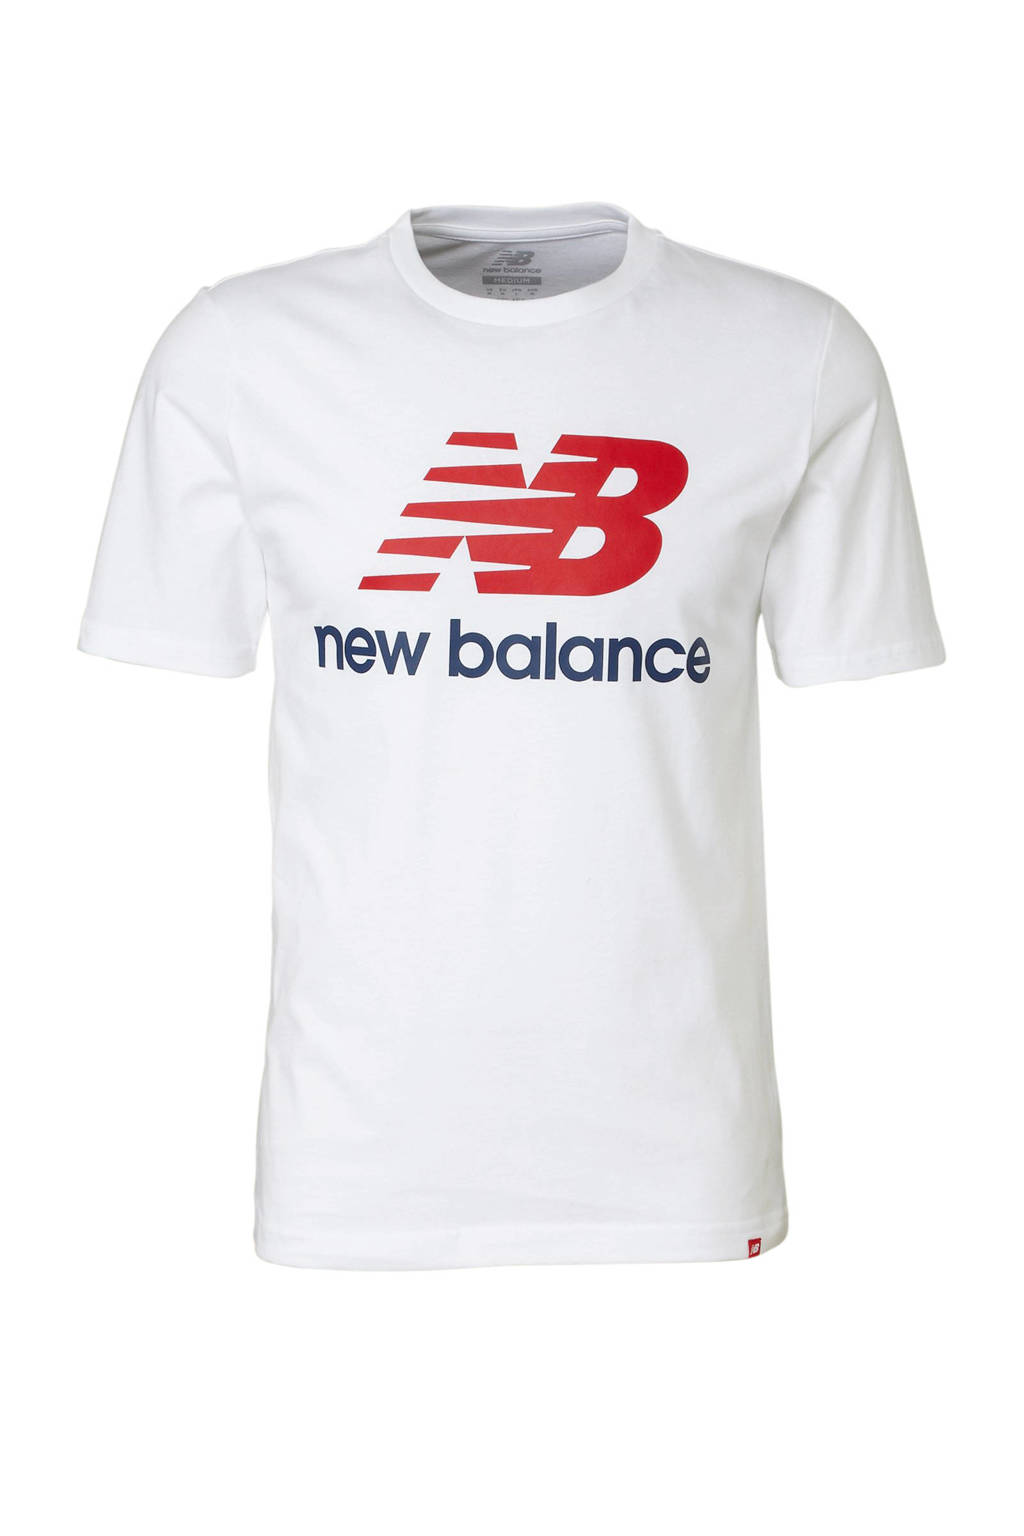 New Balance   T-shirt, Wit/rood/blauw